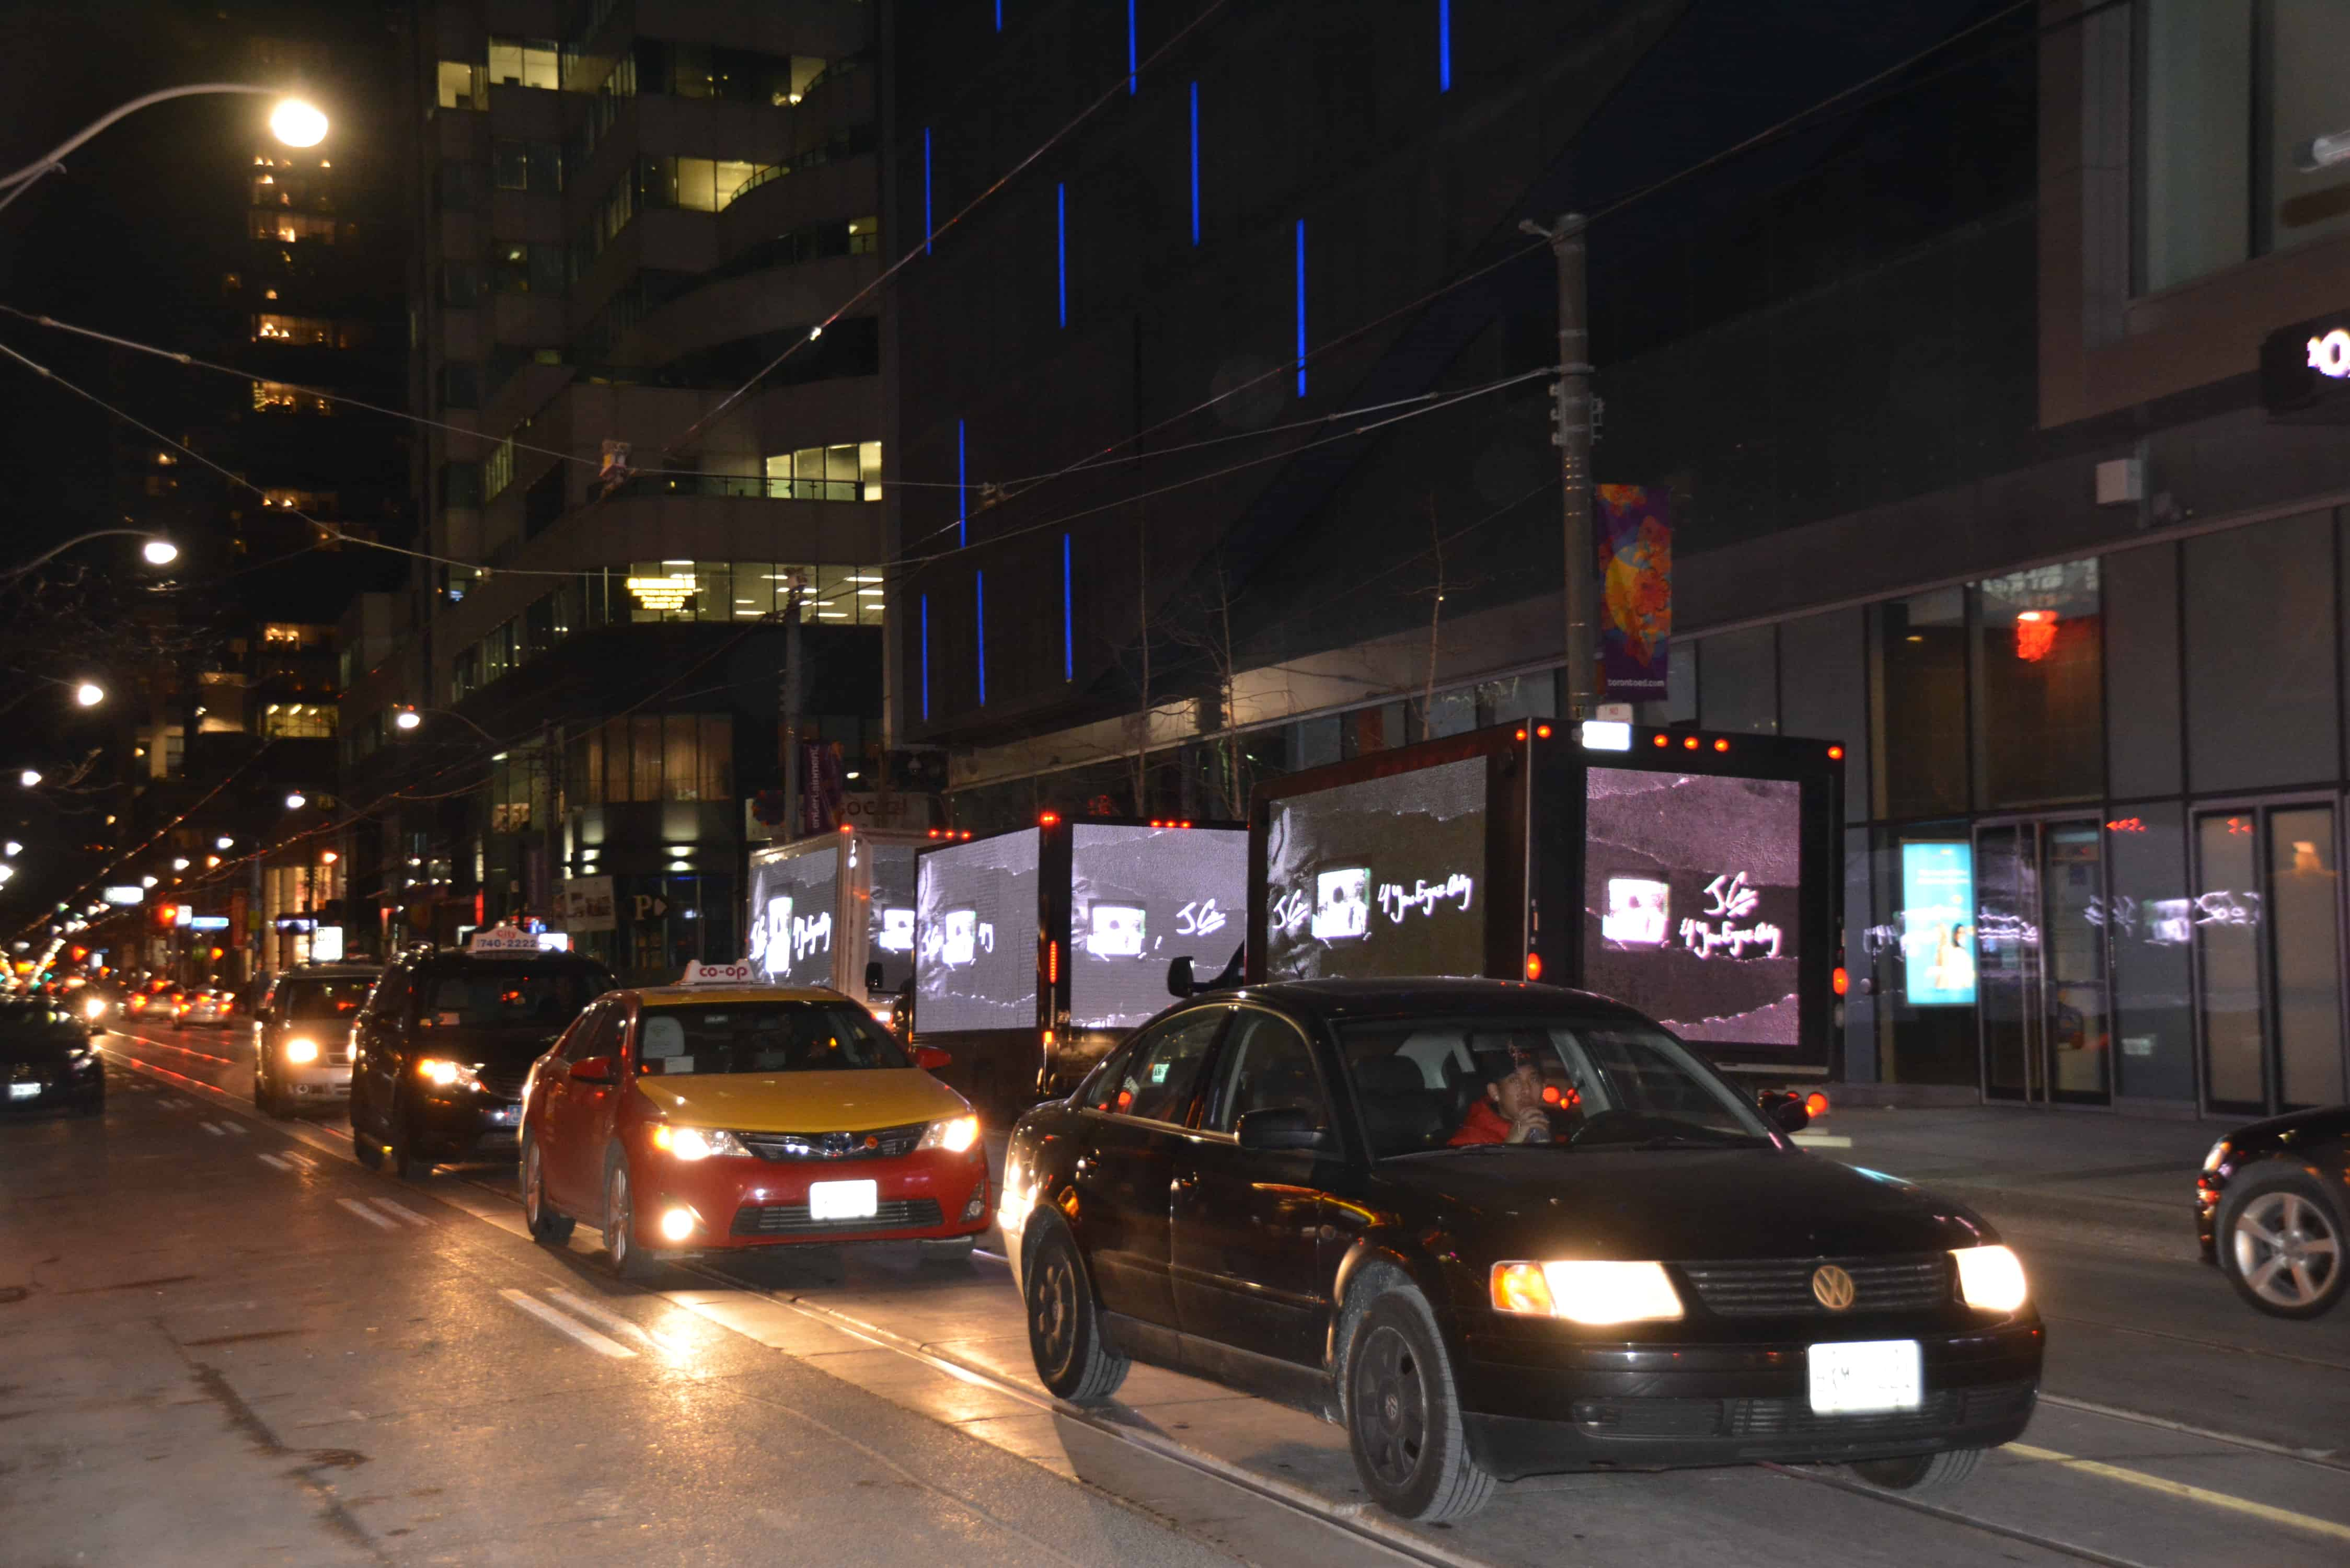 Video Trucks on rent